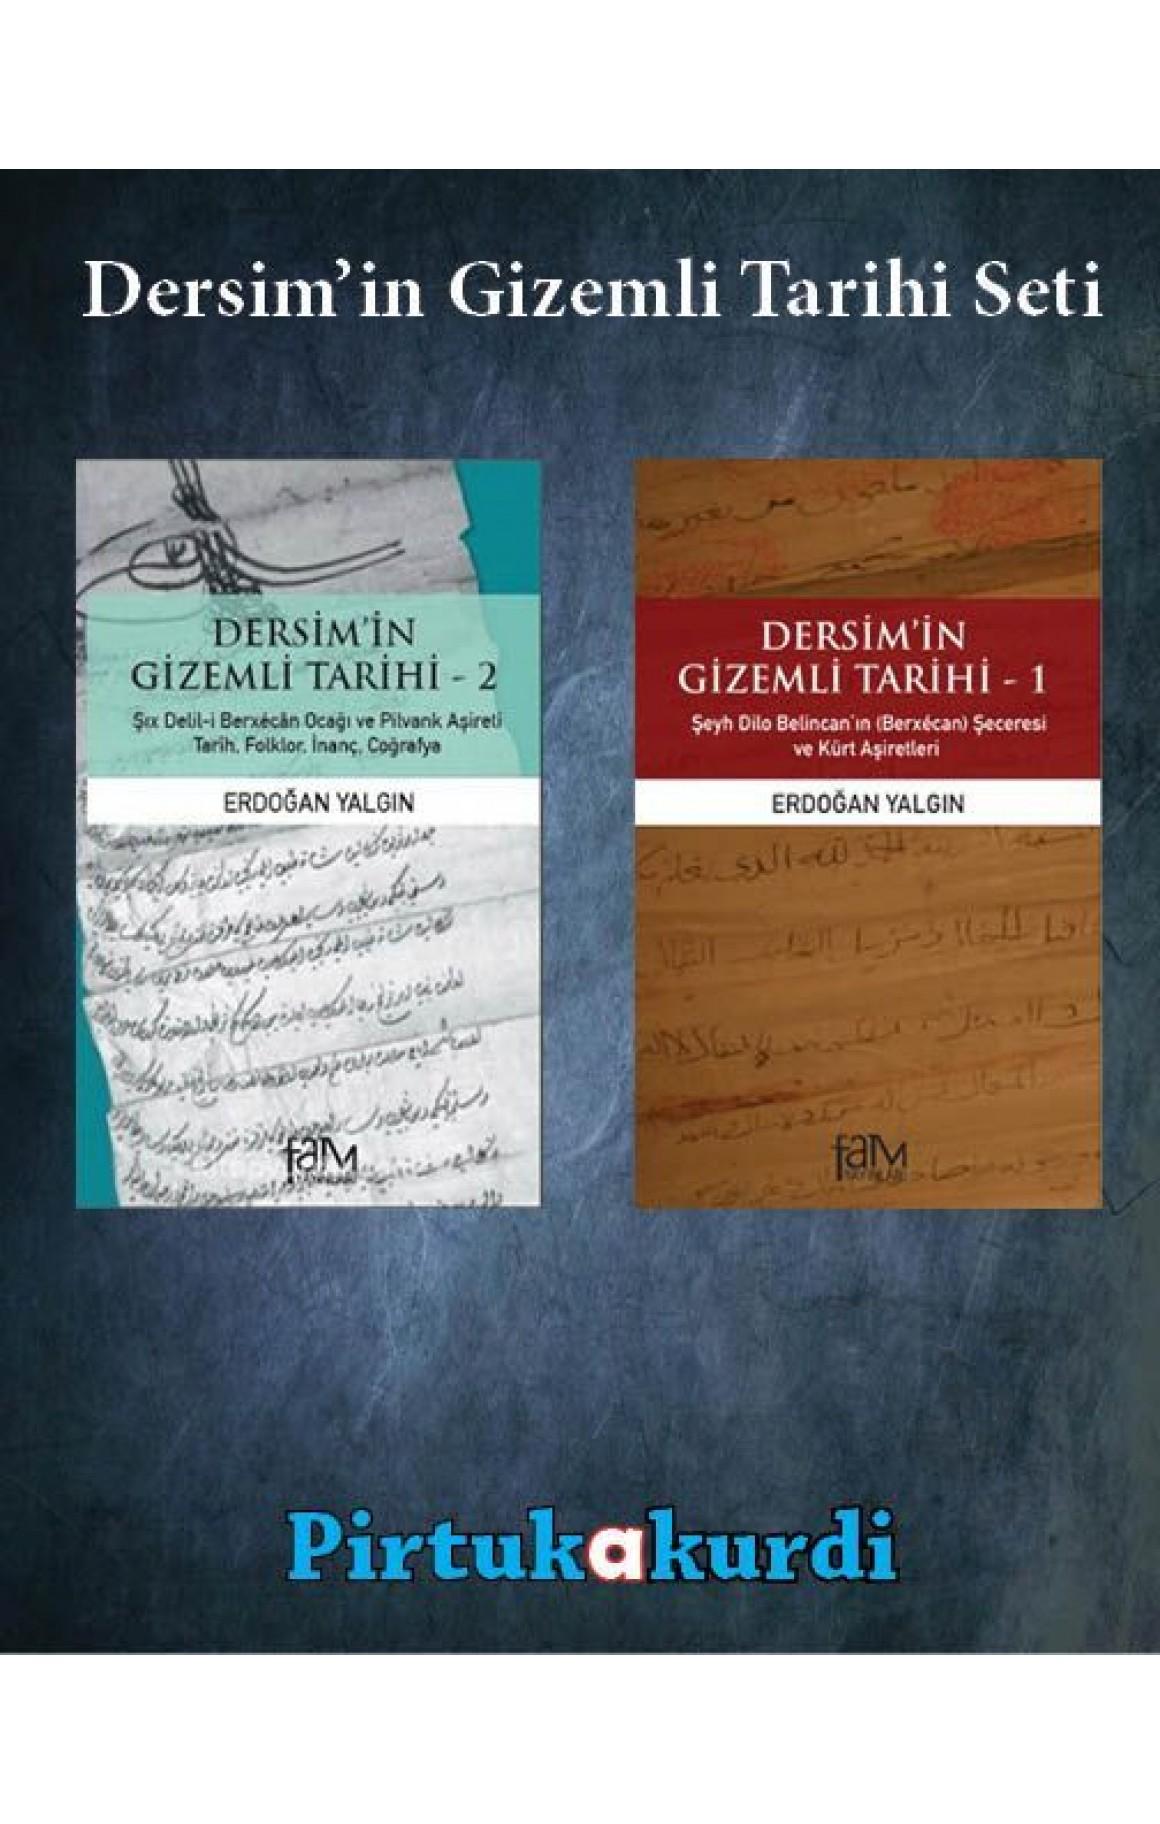 Dersim'in Gizemli Tarihi Seti